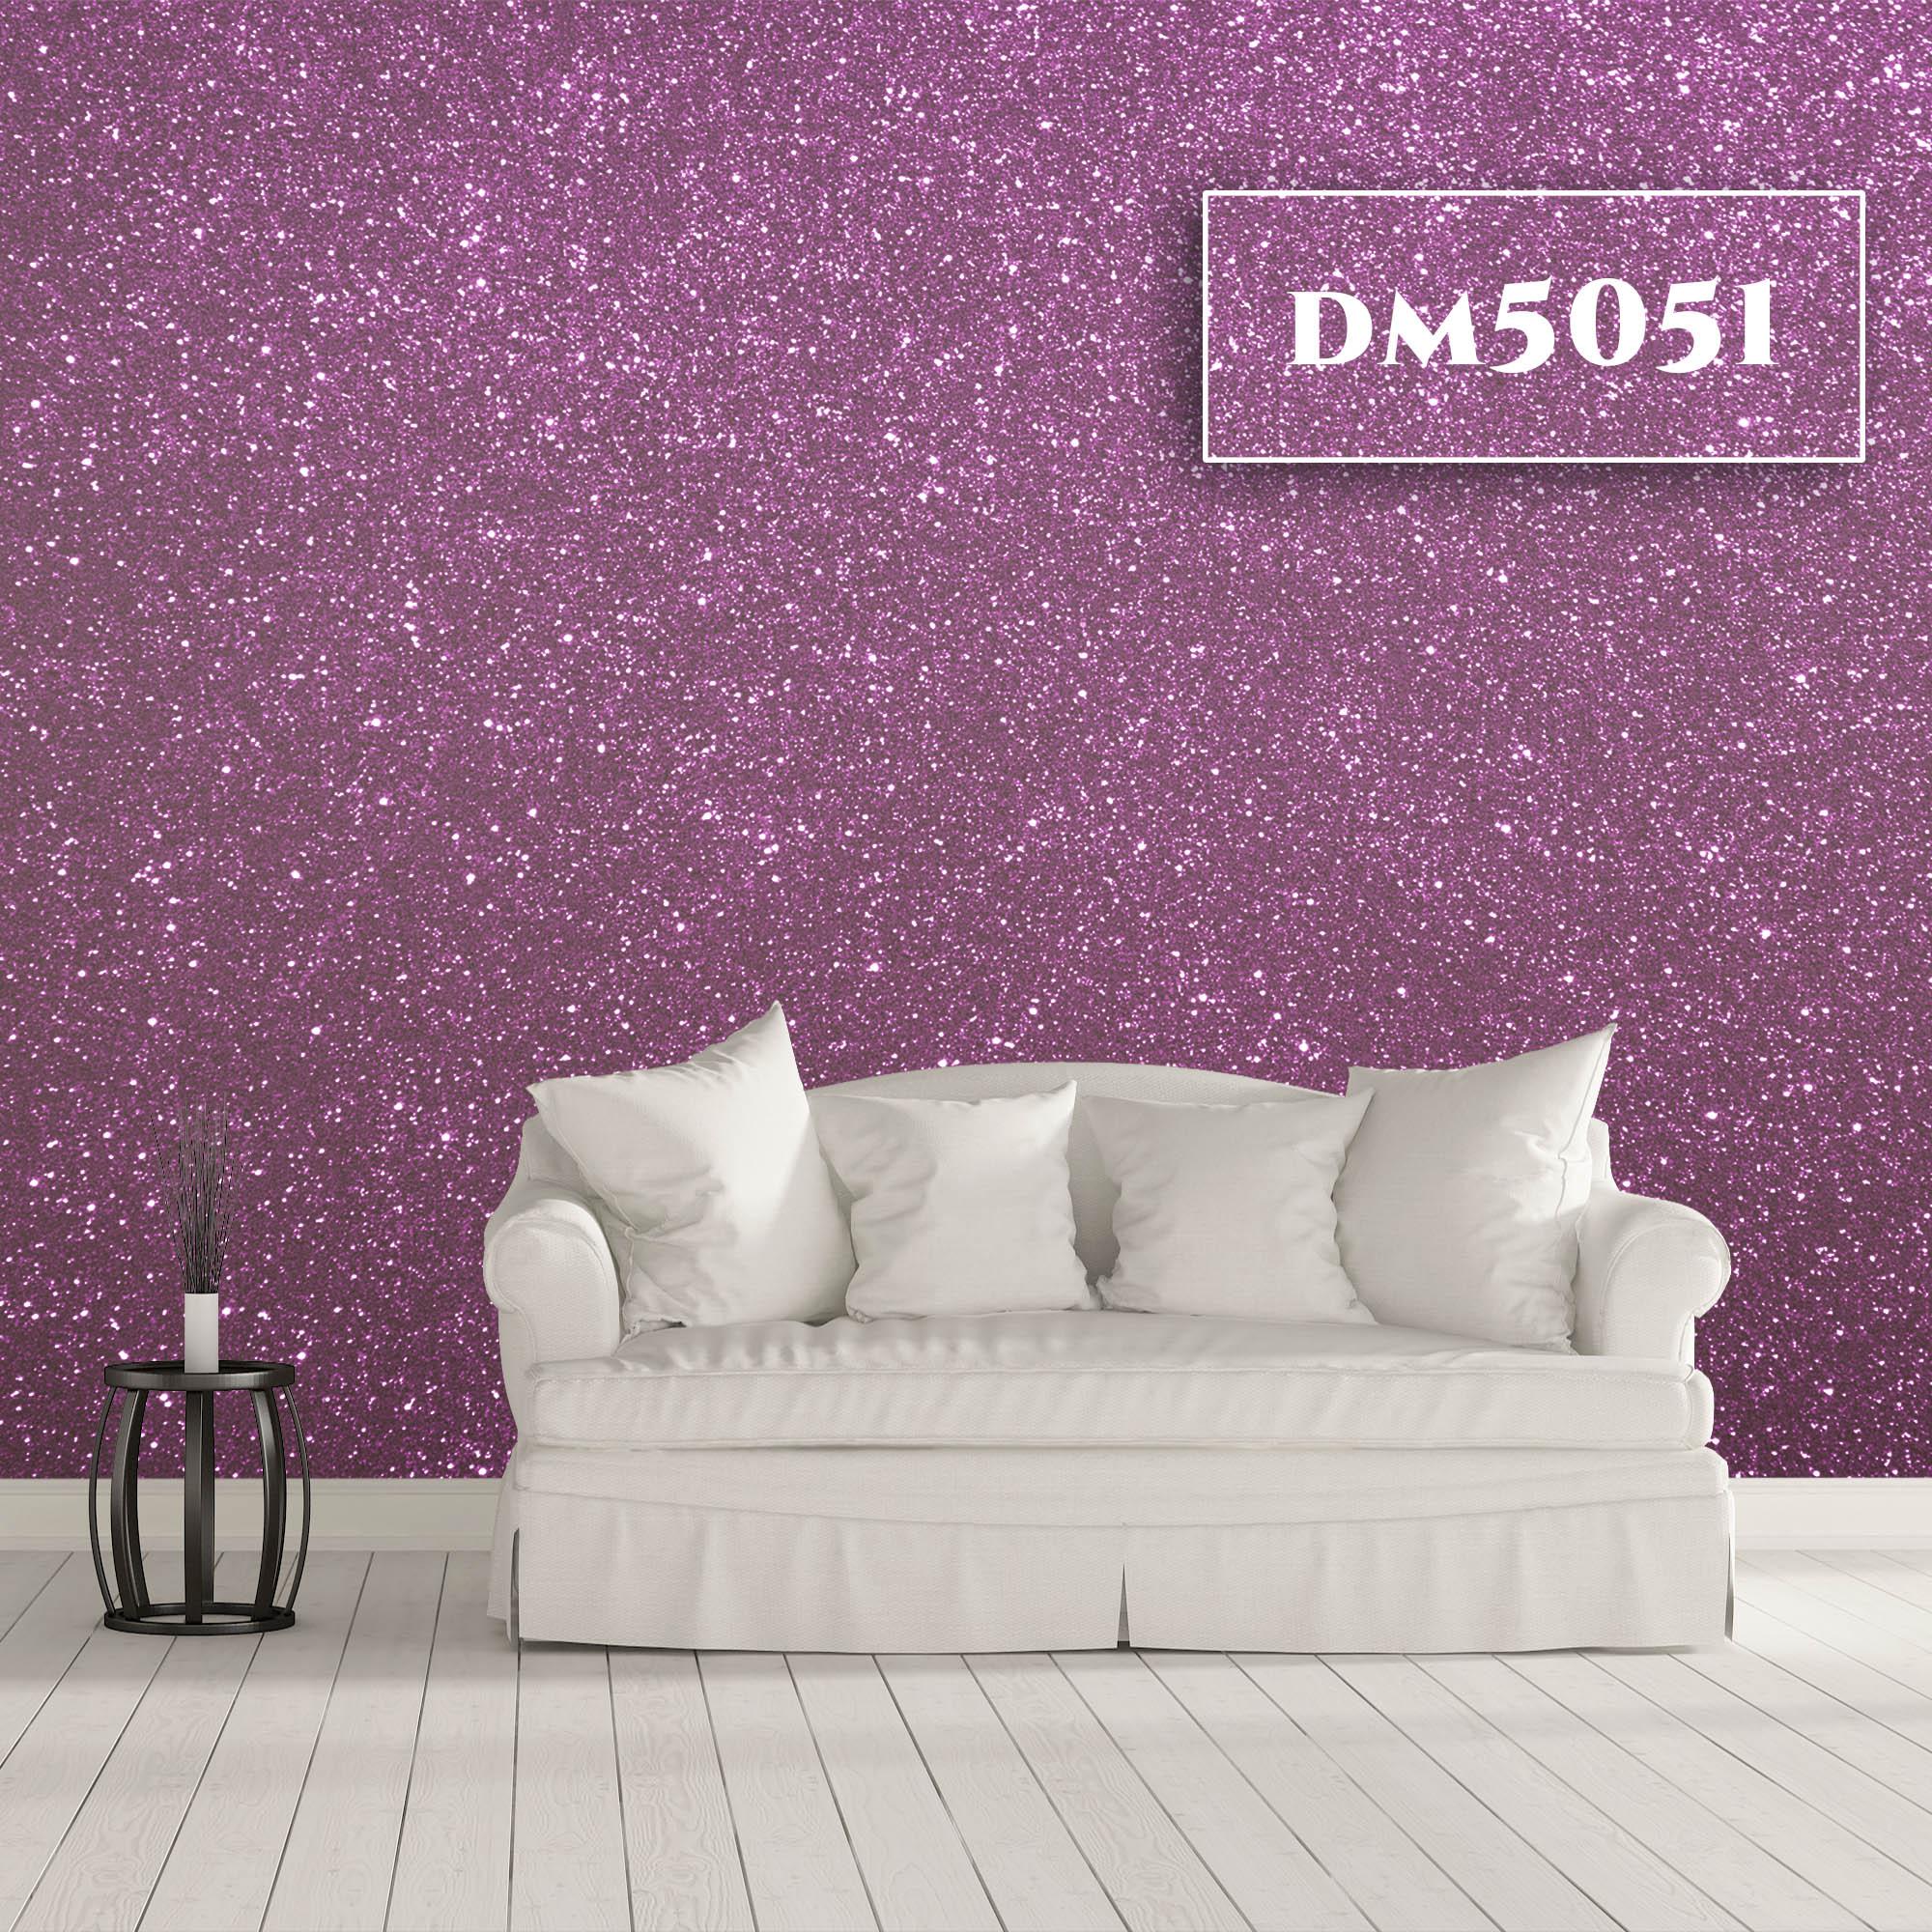 DM5051